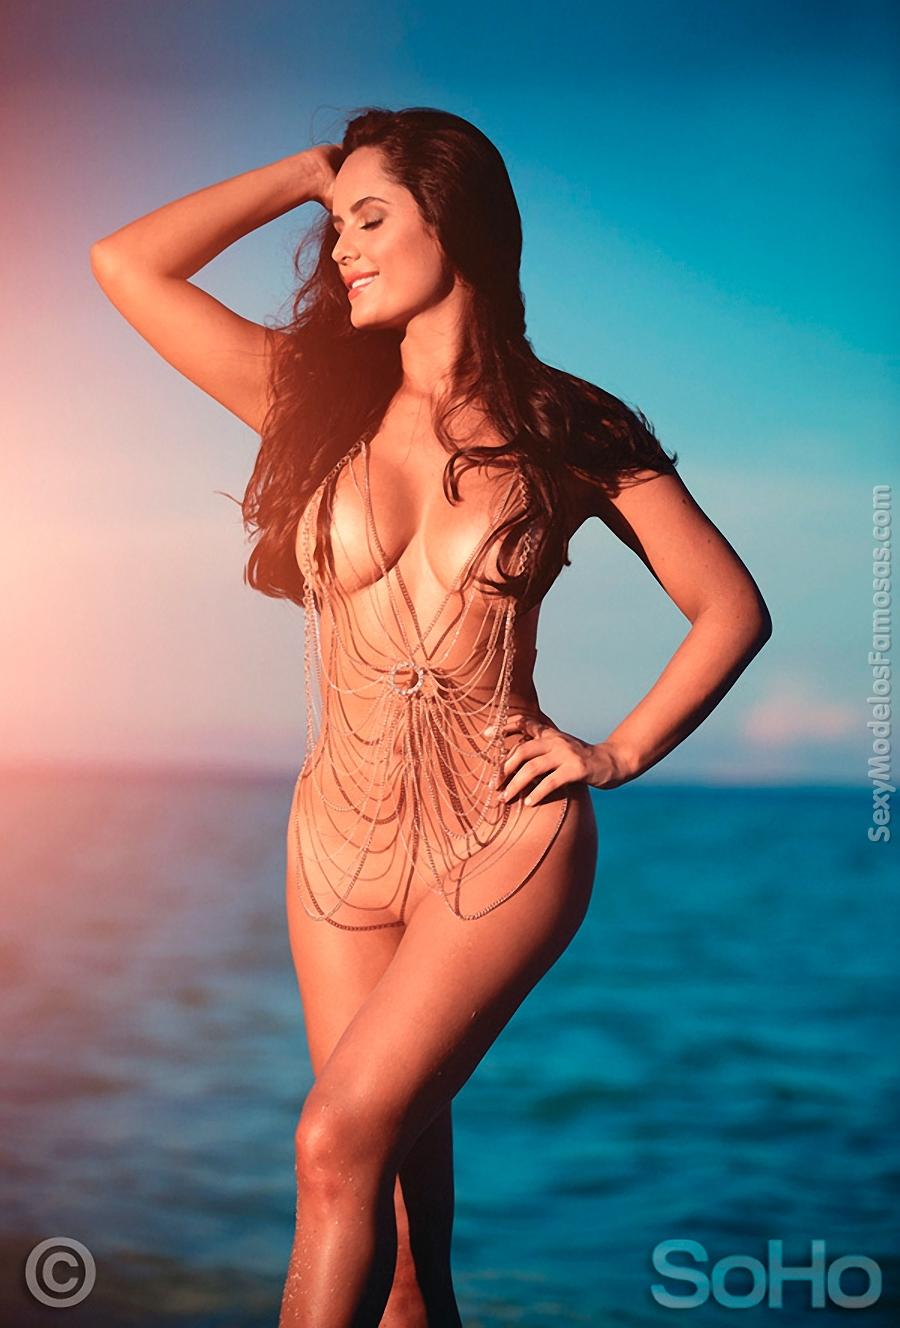 Ana Lucia Dominguez Nude showing xxx images for lucia dominguez xxx | www.pornsink